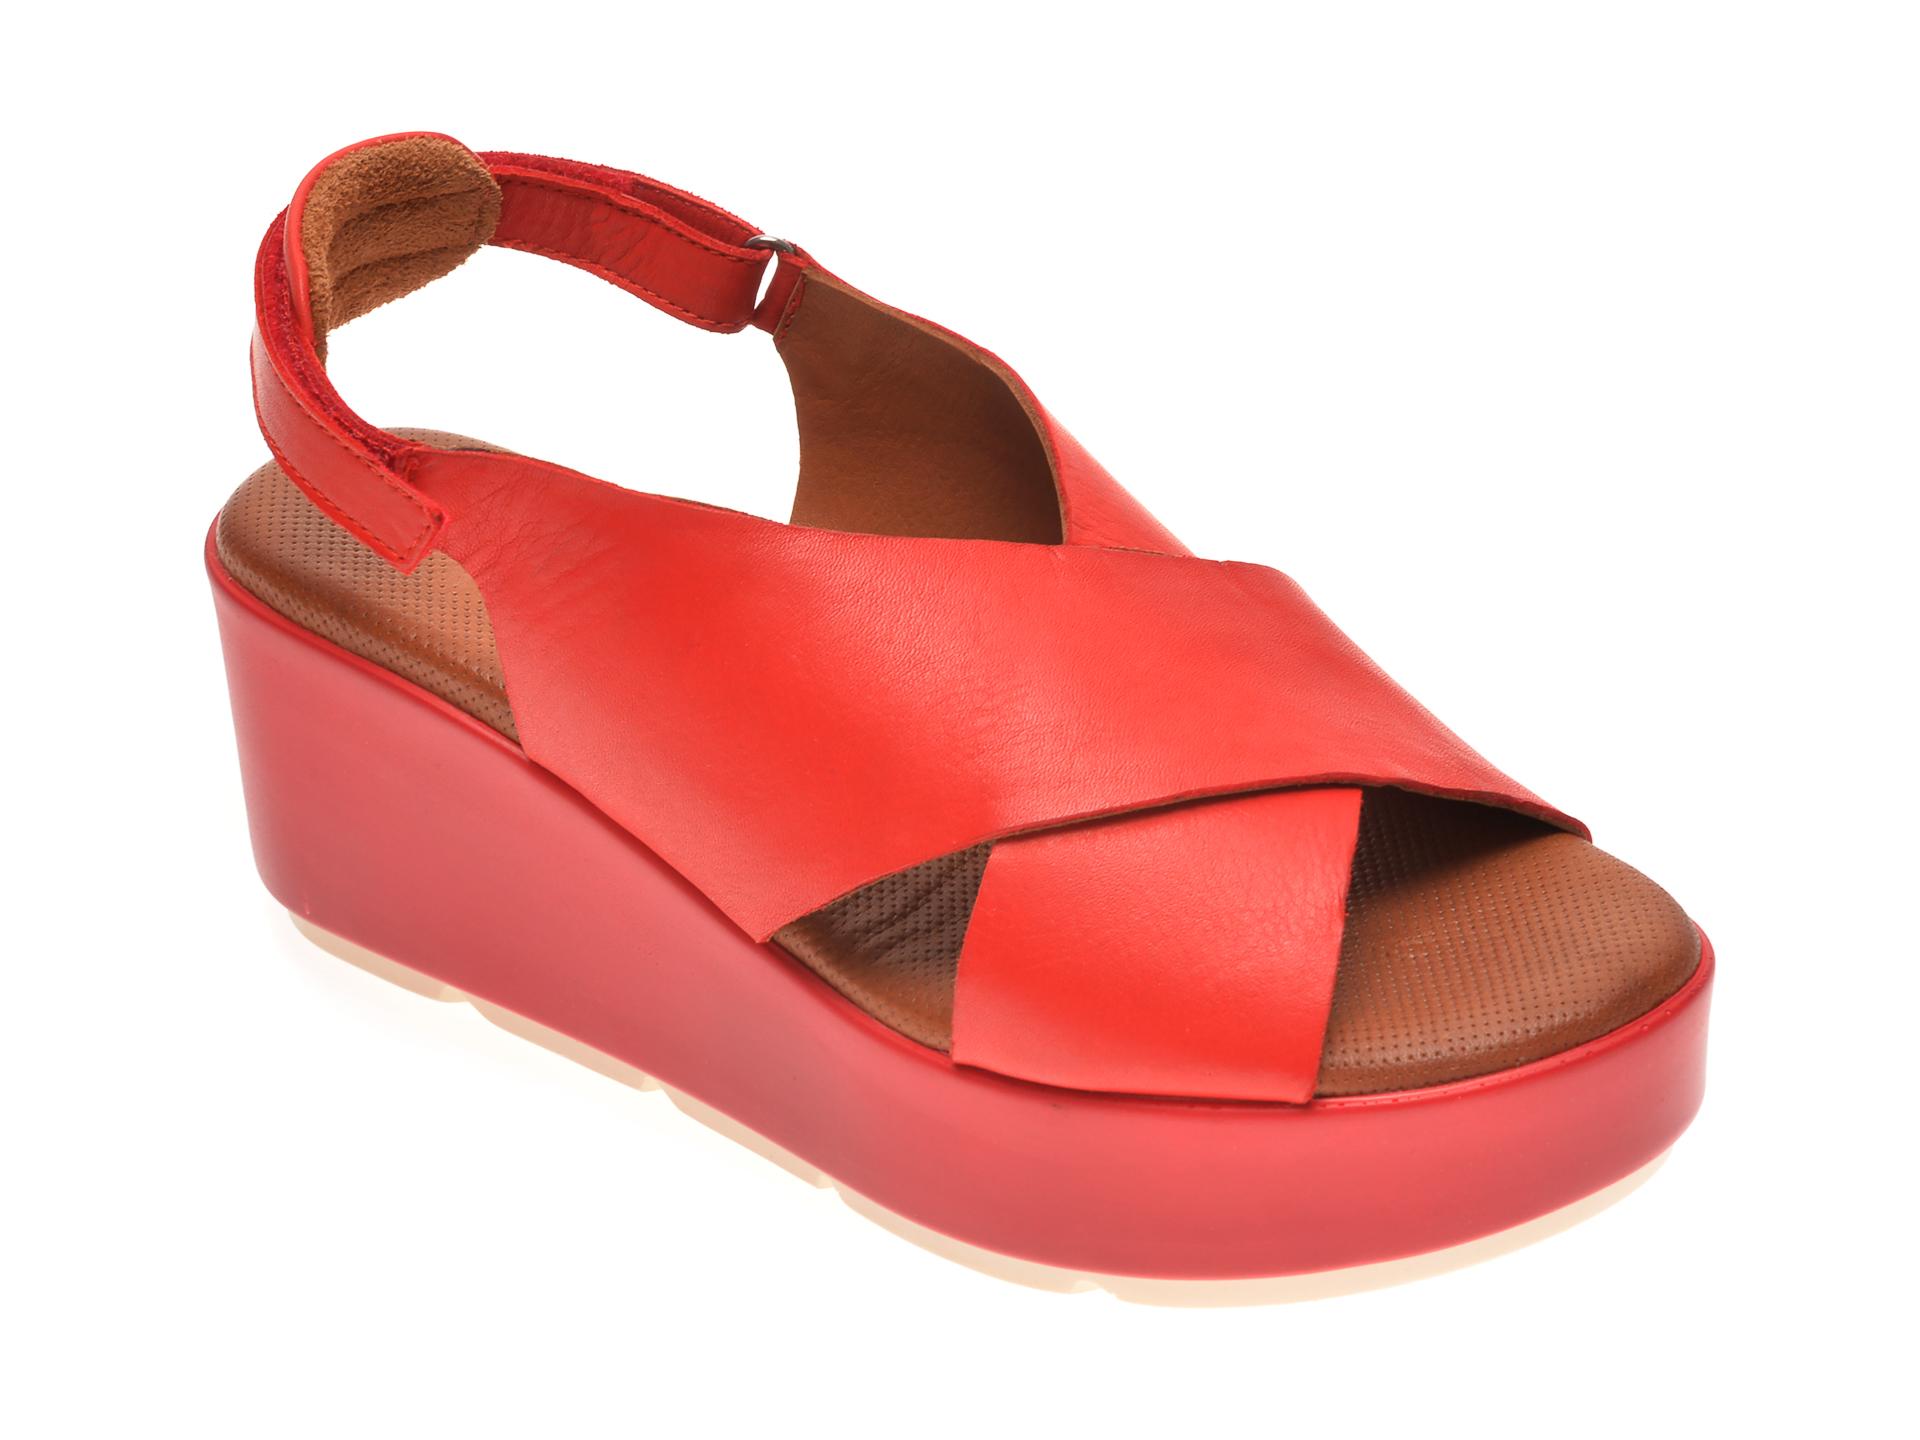 Sandale BABOOS rosii, 2520, din piele naturala imagine